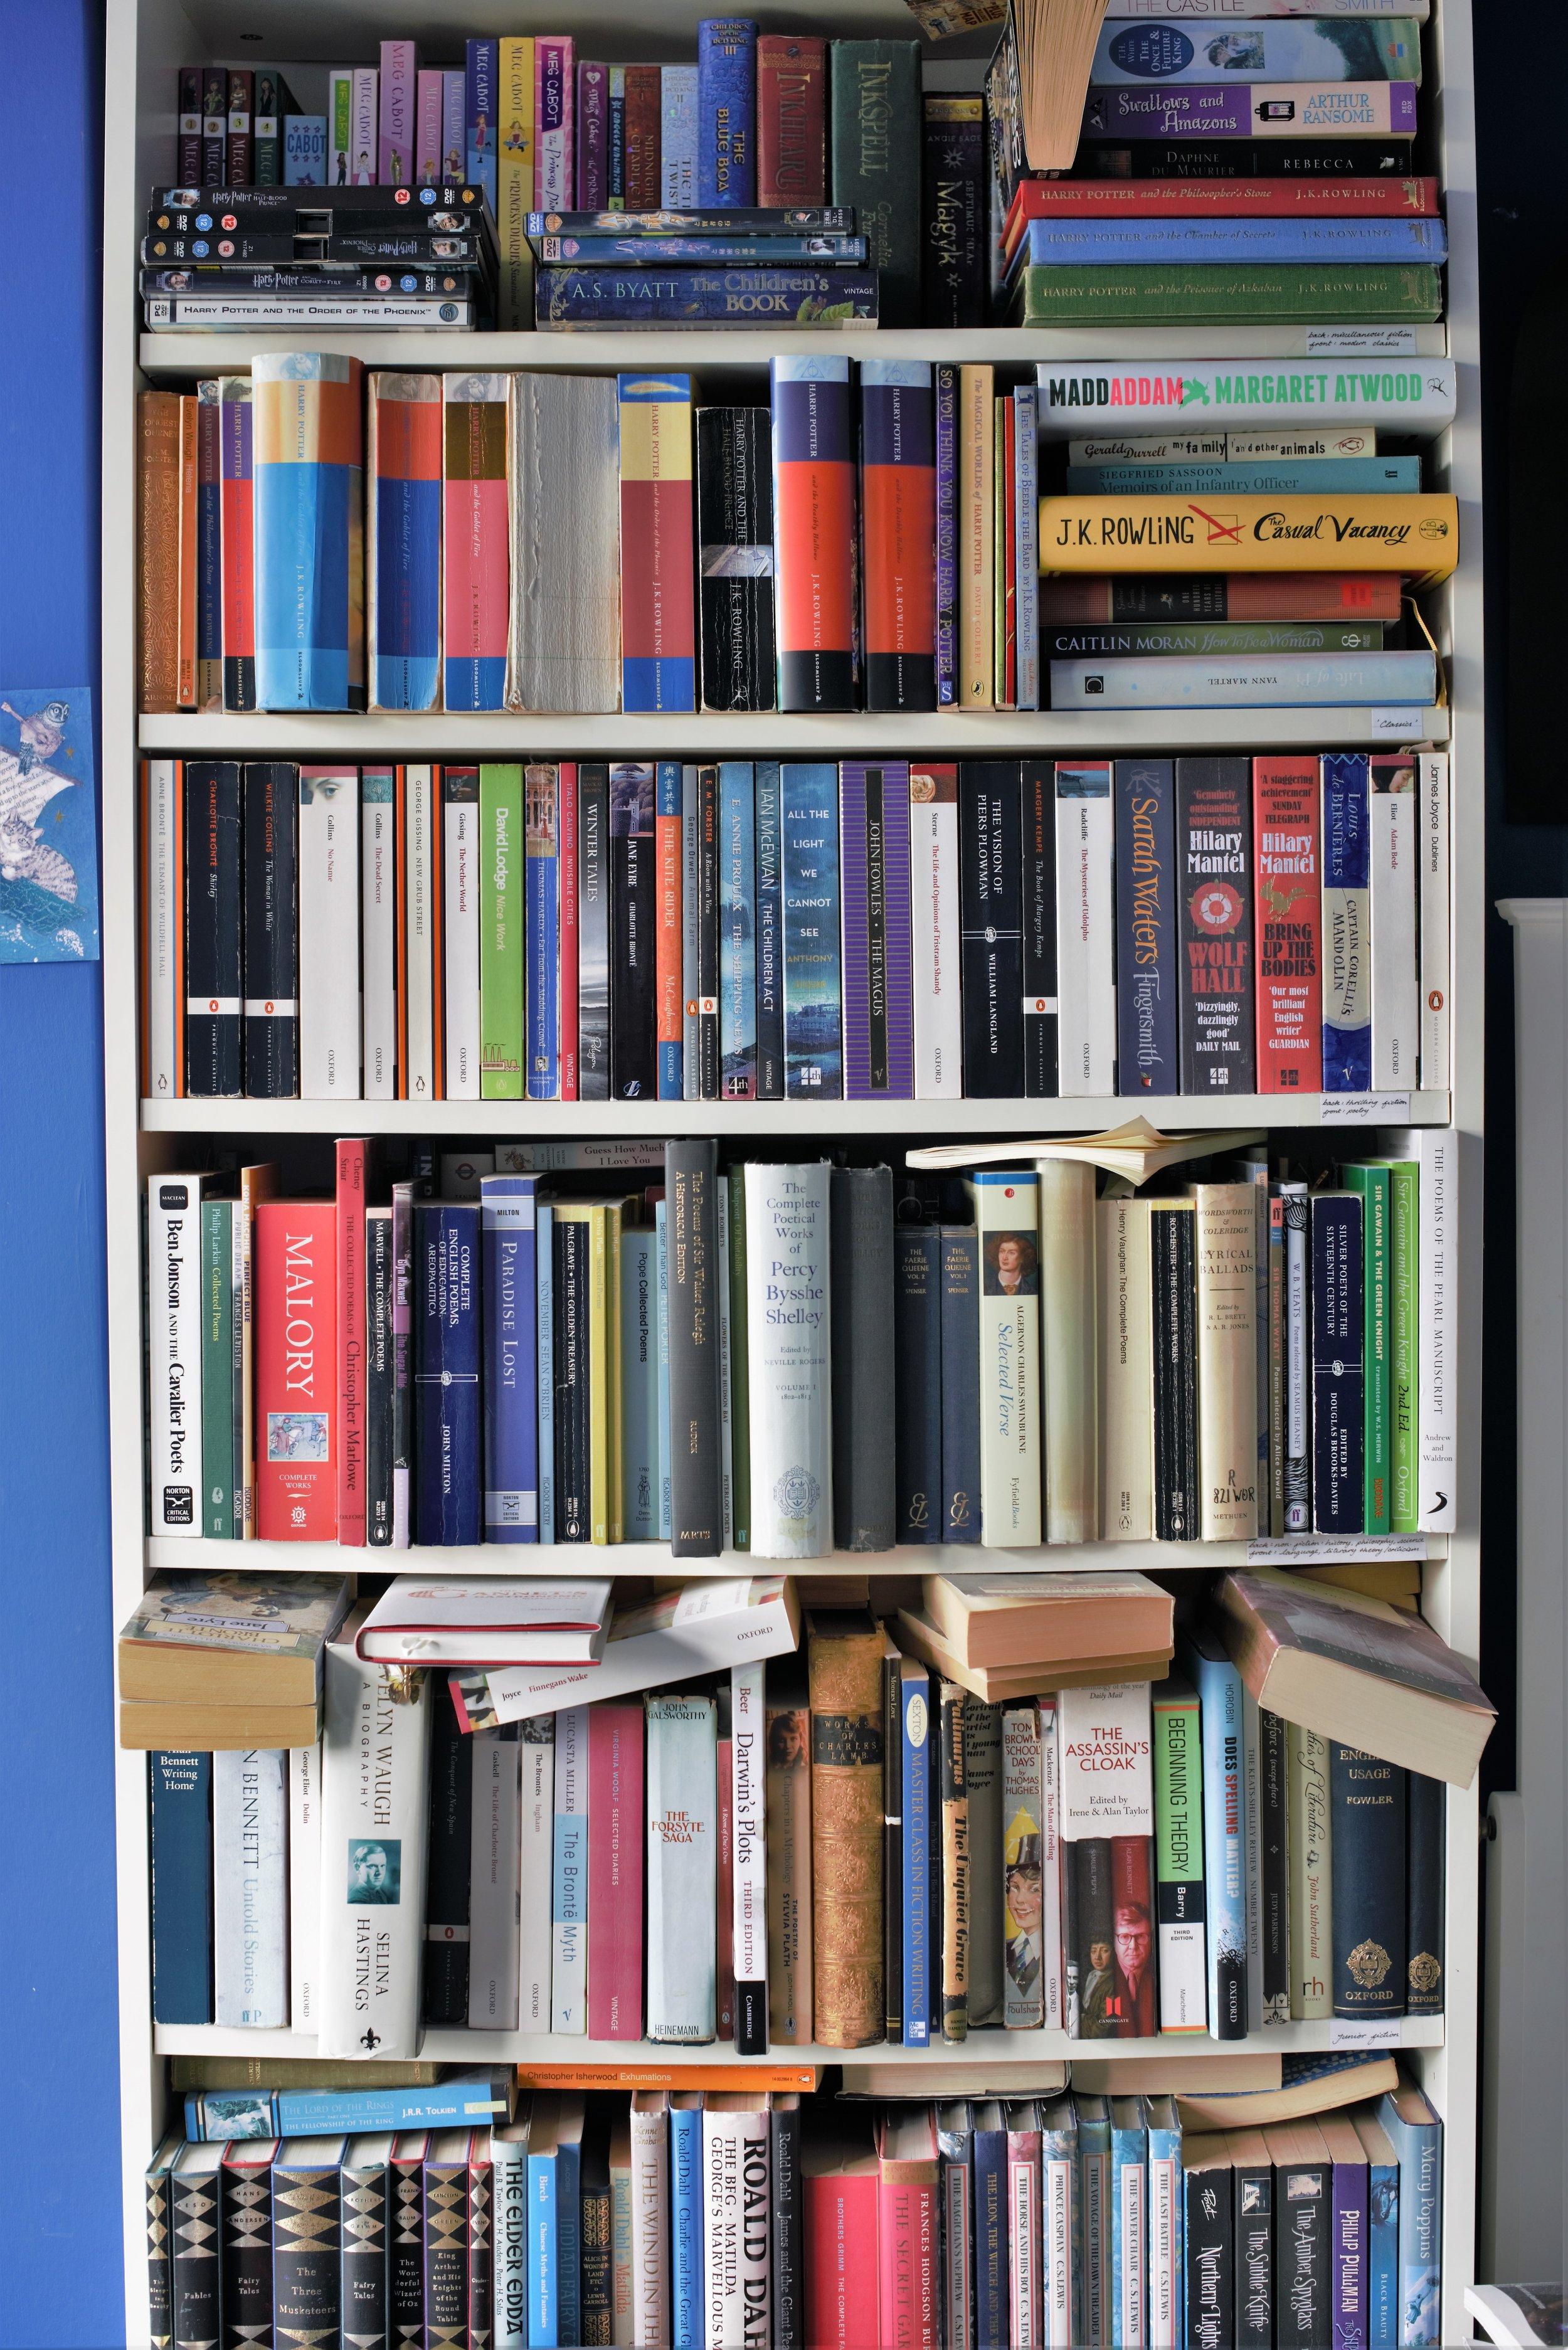 The Bookshelf project